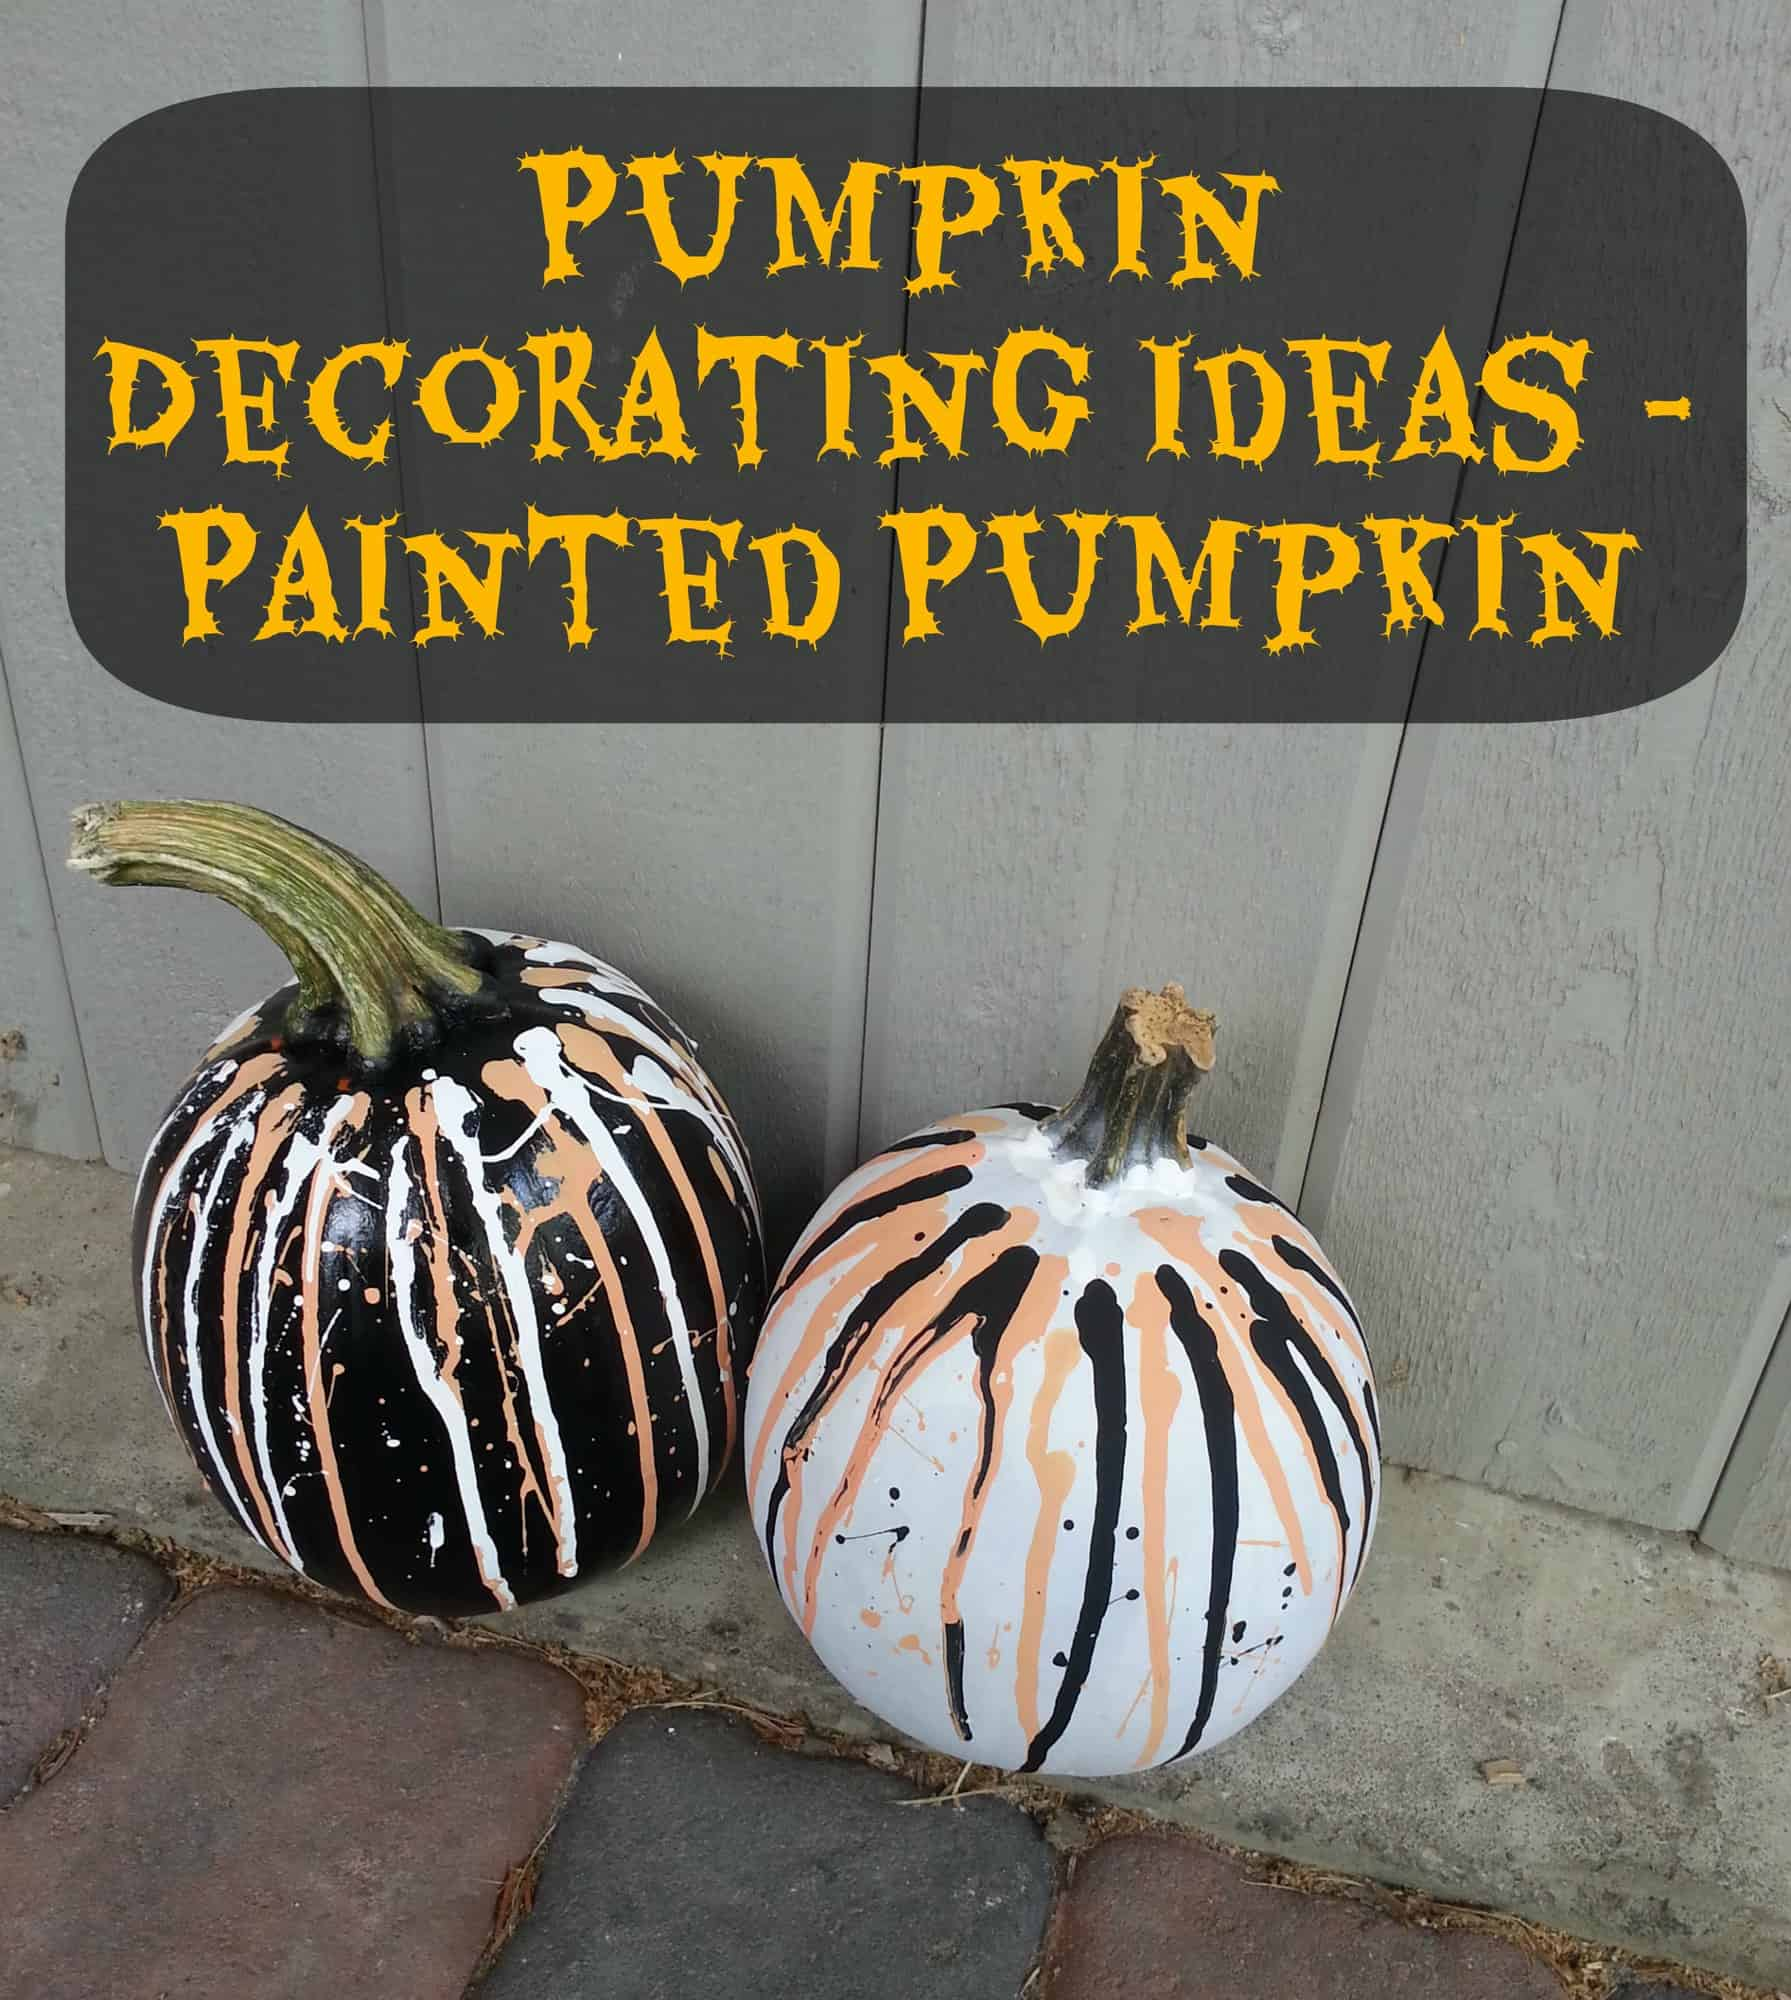 Pumpkin Decorating Ideas - Painted Pumpkins 4